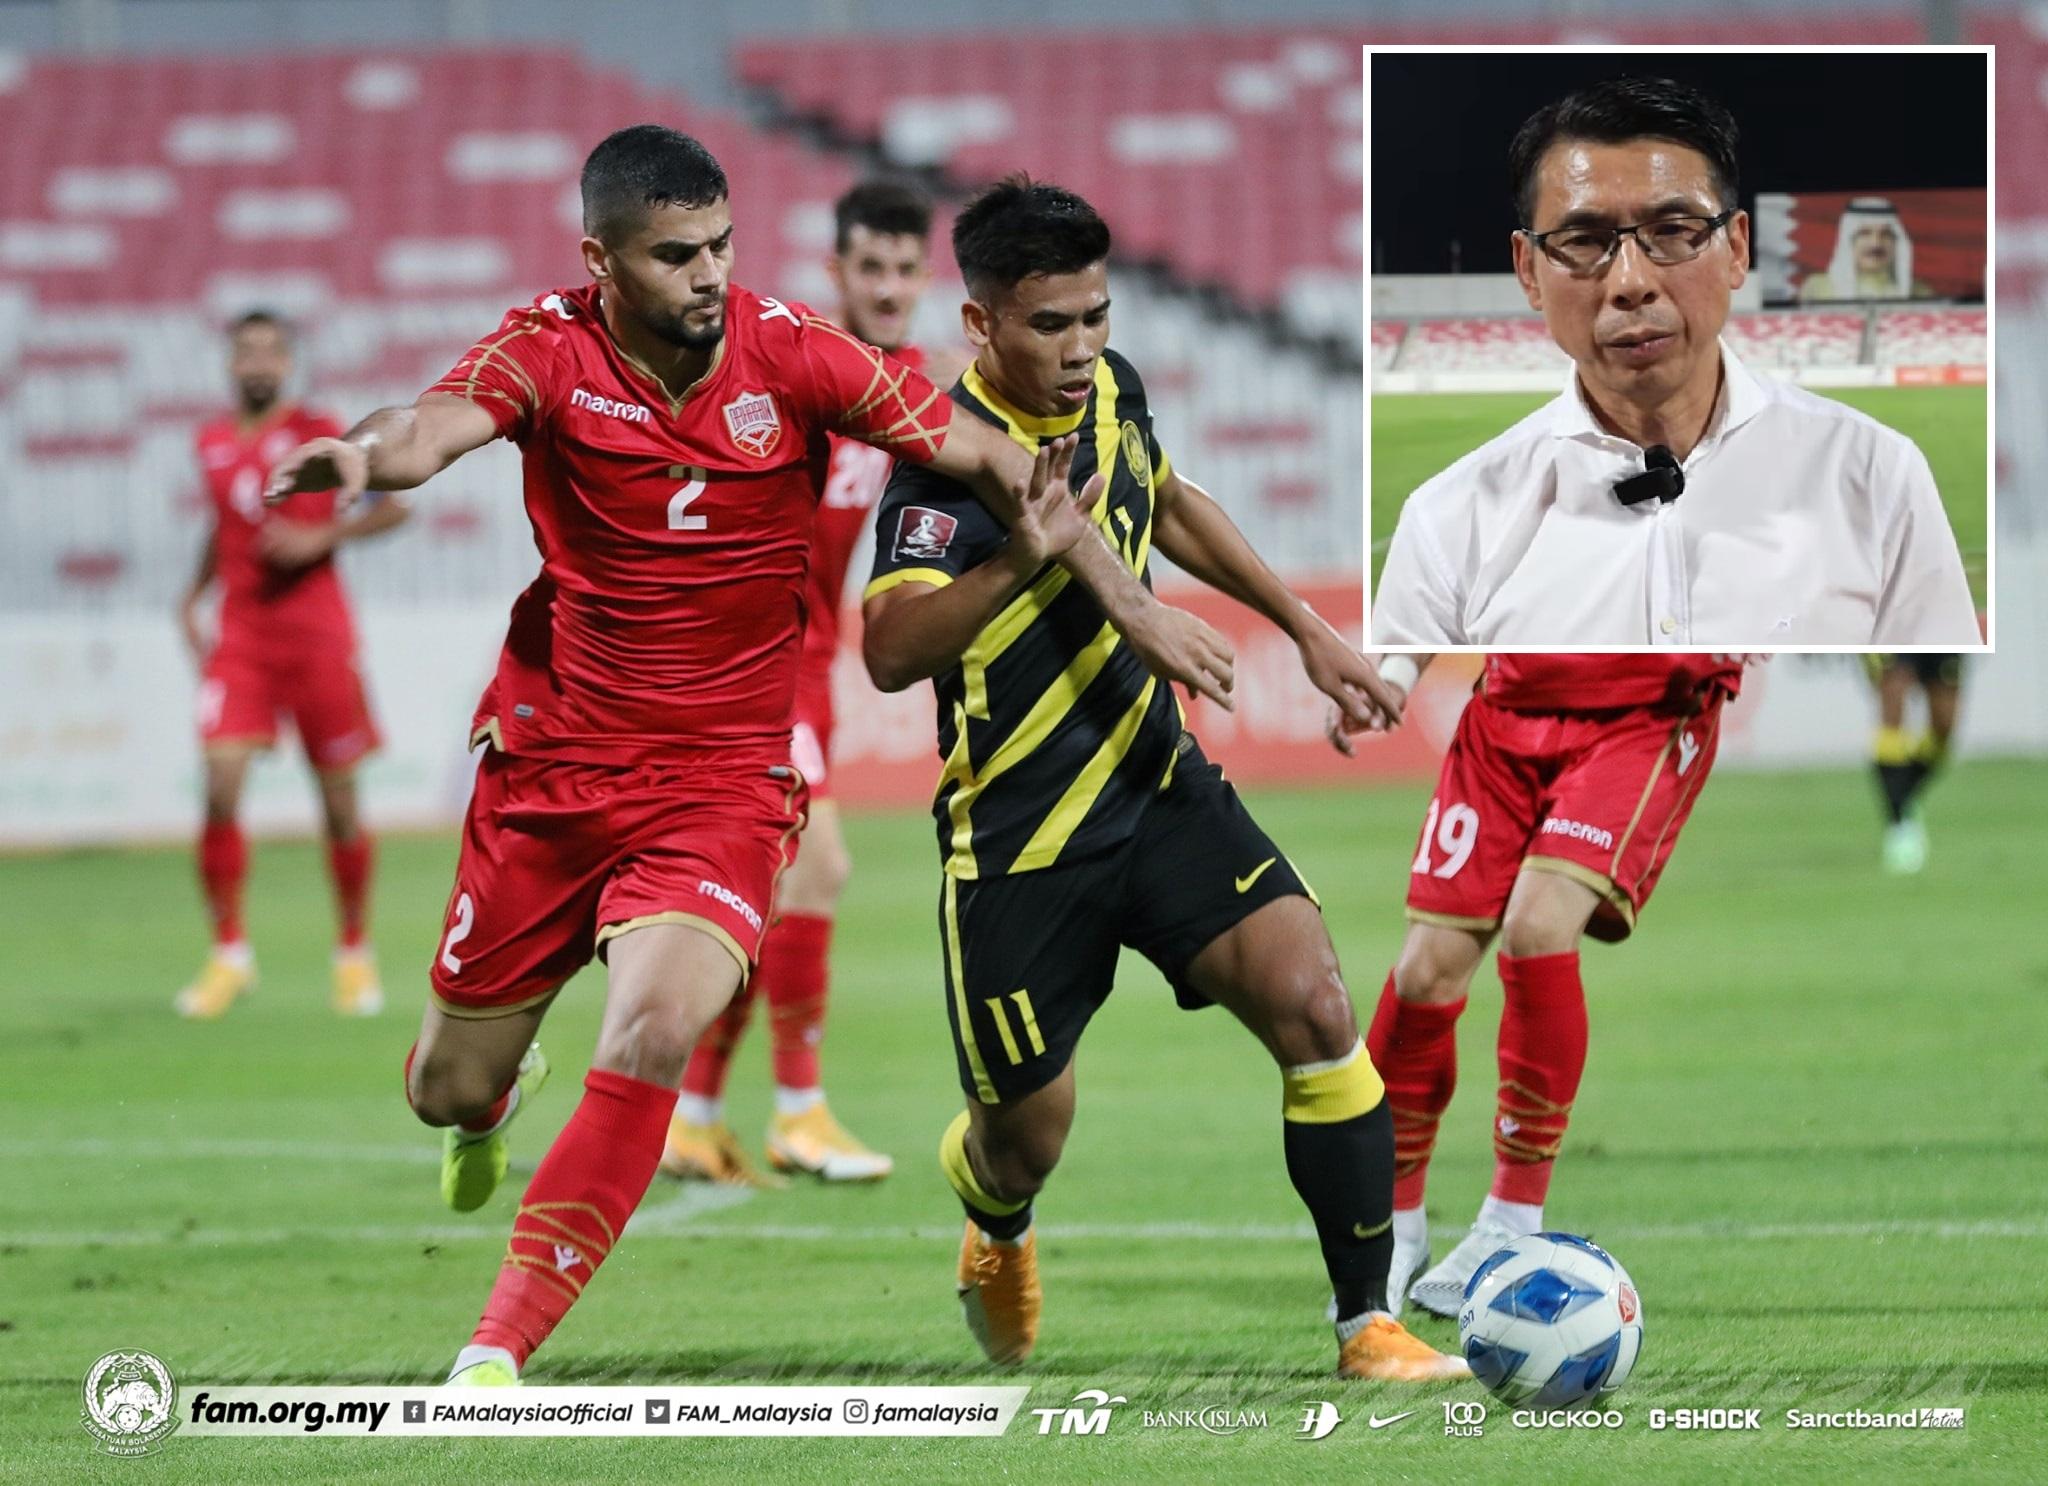 Safawi Rasid Malaysia Bahrain Persahabatan 2021 Tan Cheng Hoe Jaga Emosi